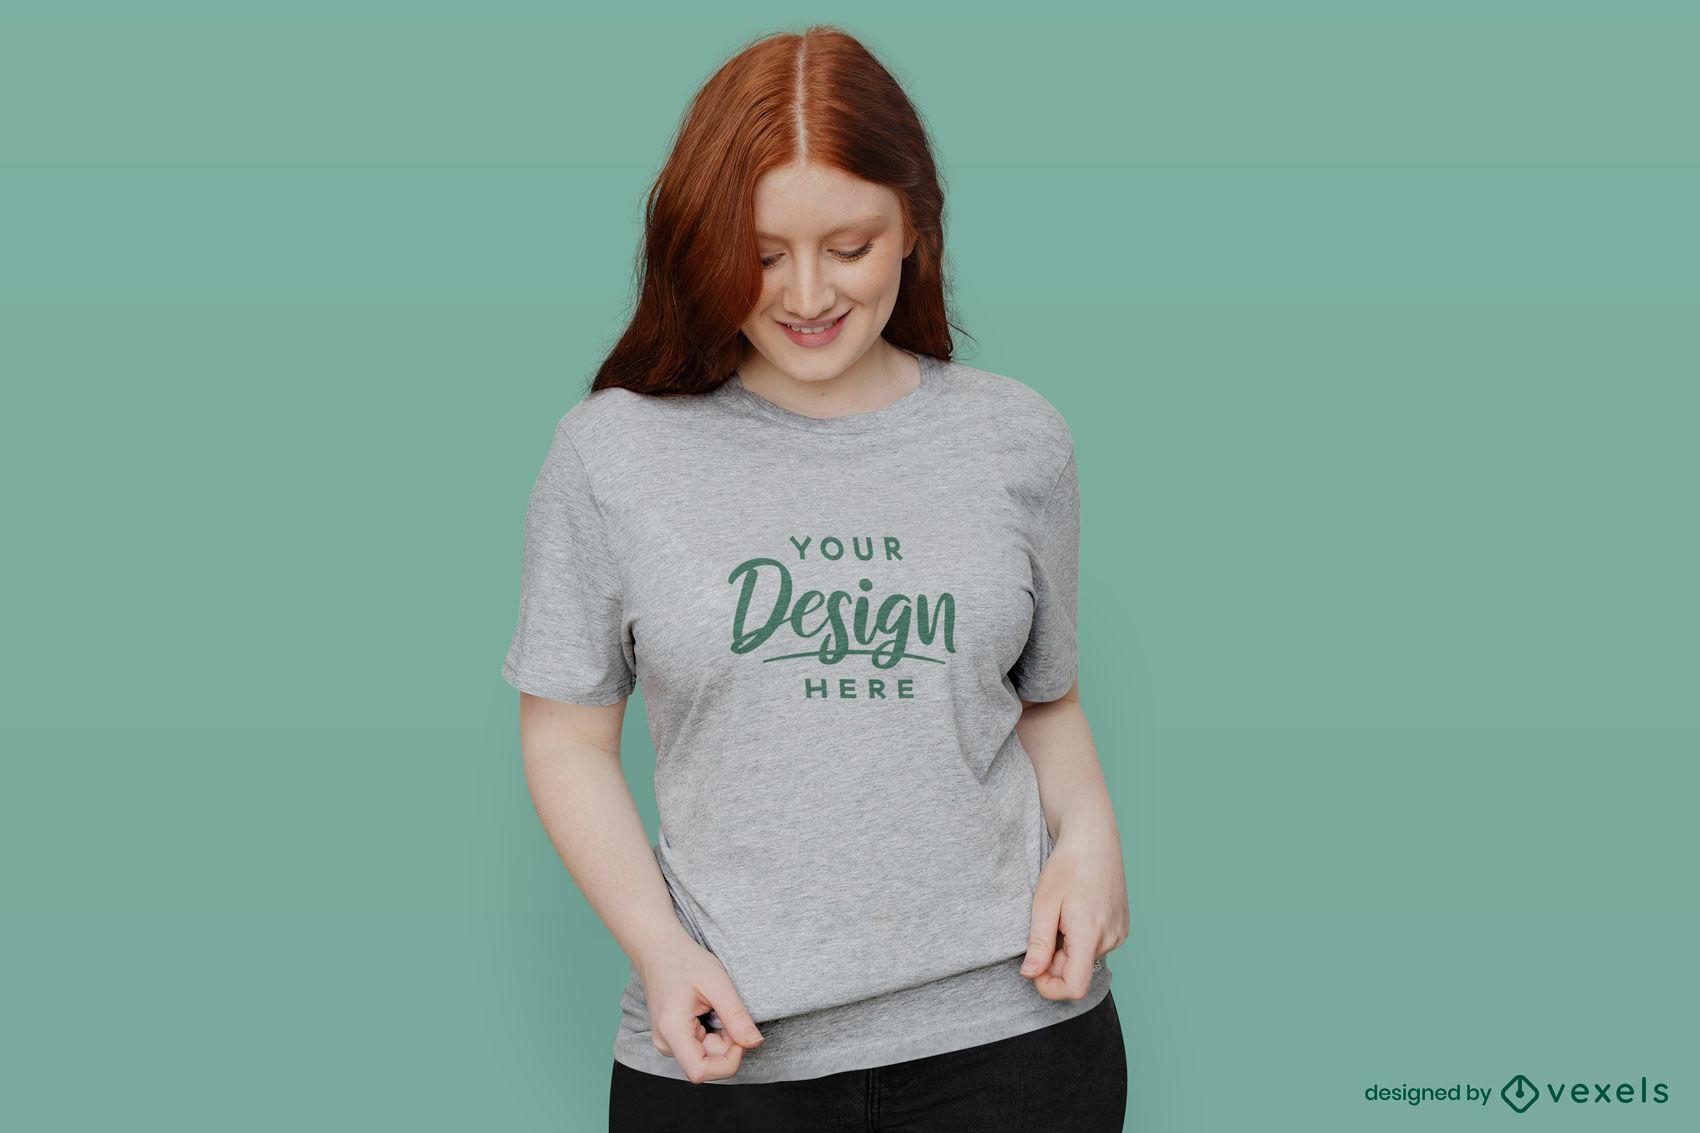 Girl in grey t-shirt green background mockup